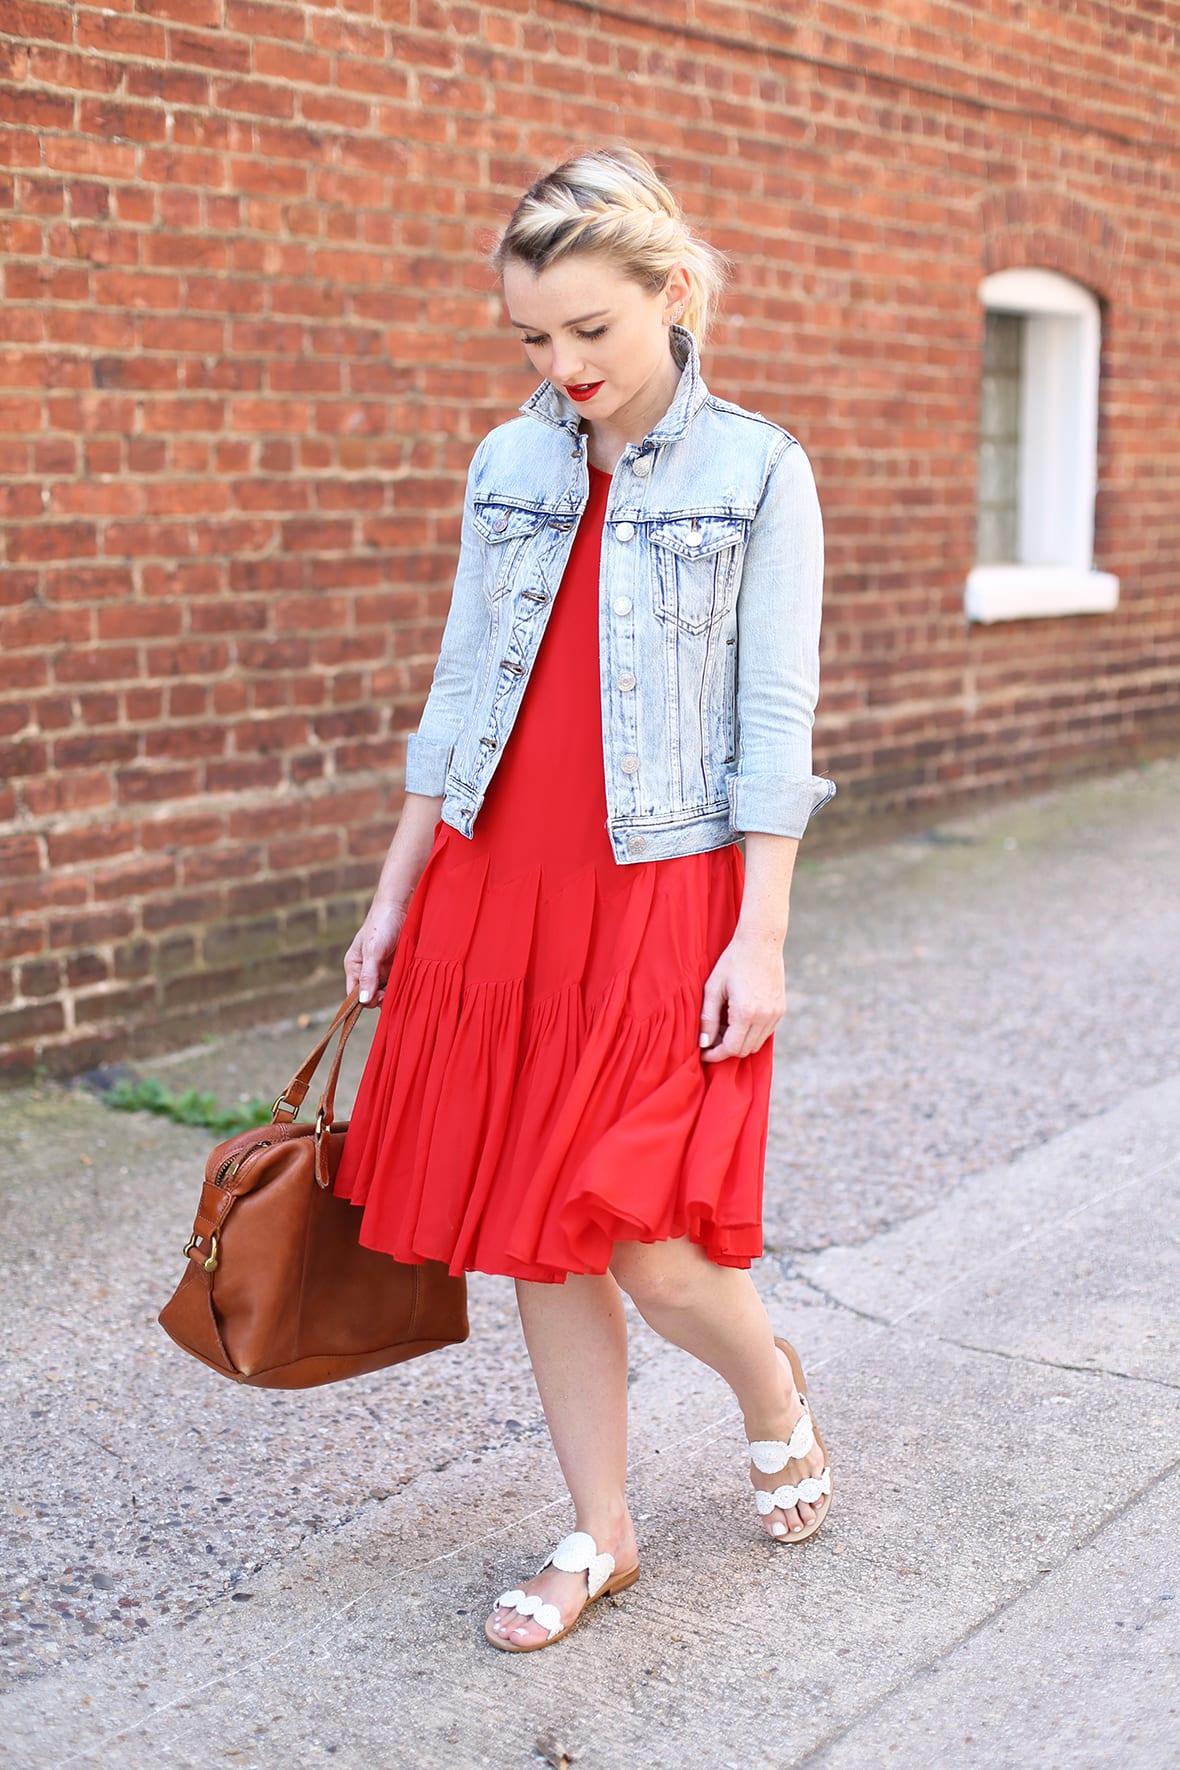 Red Dress And Denim Jacket For Summer - Poor Little It Girl